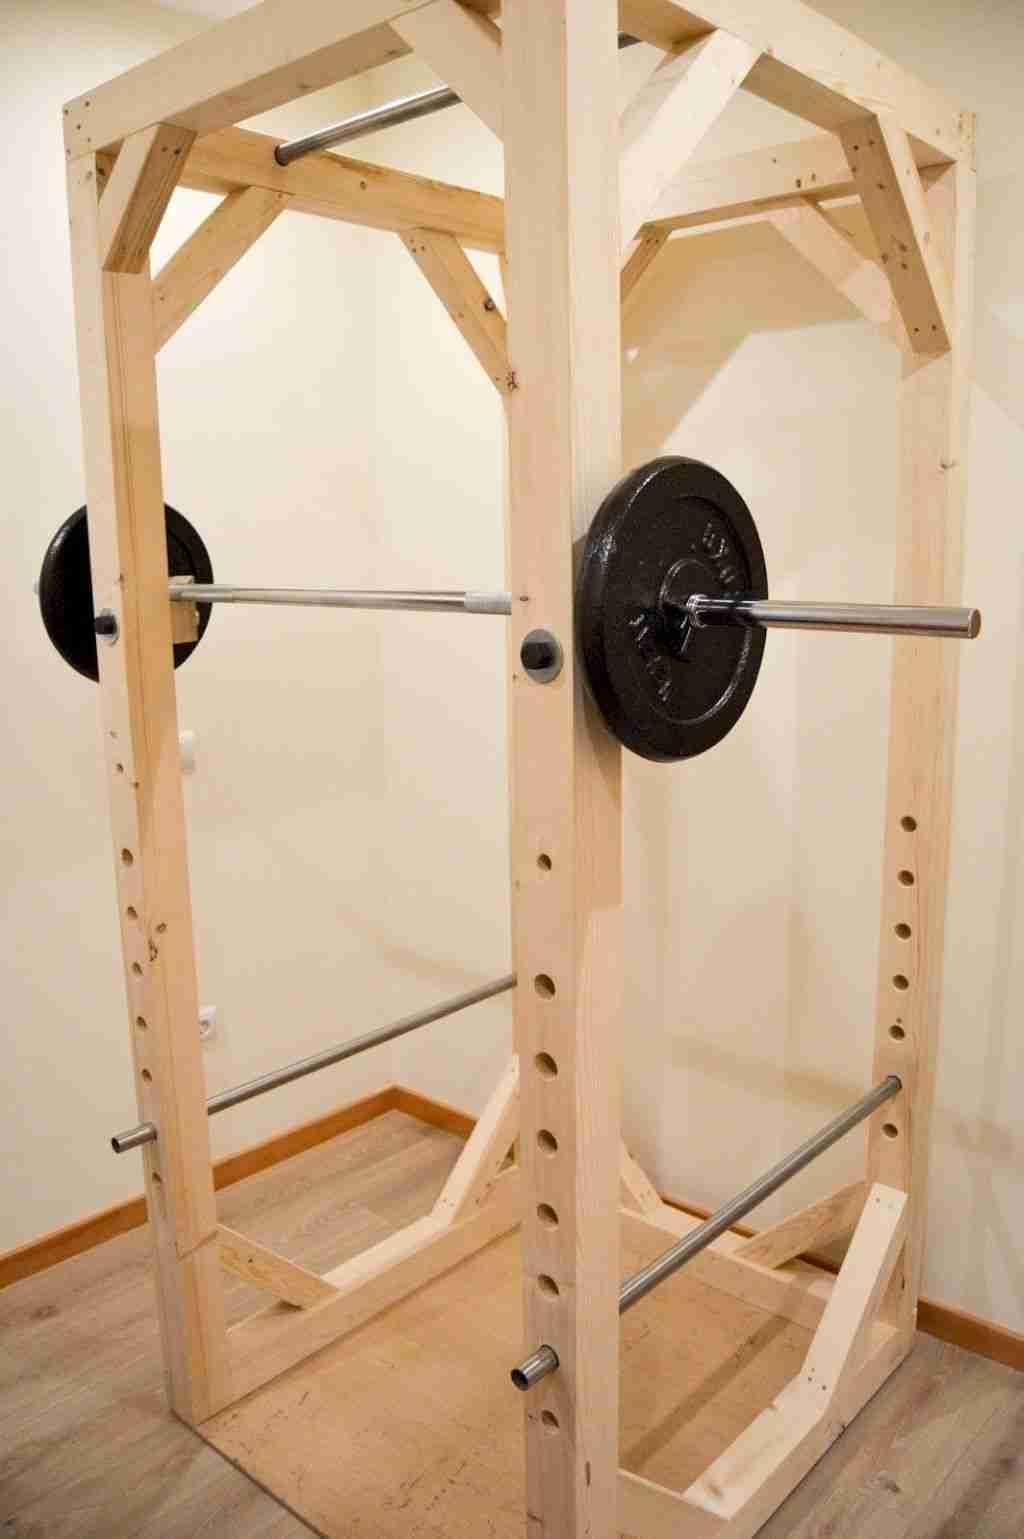 Beautiful fitness room ideas centeroom workout diy